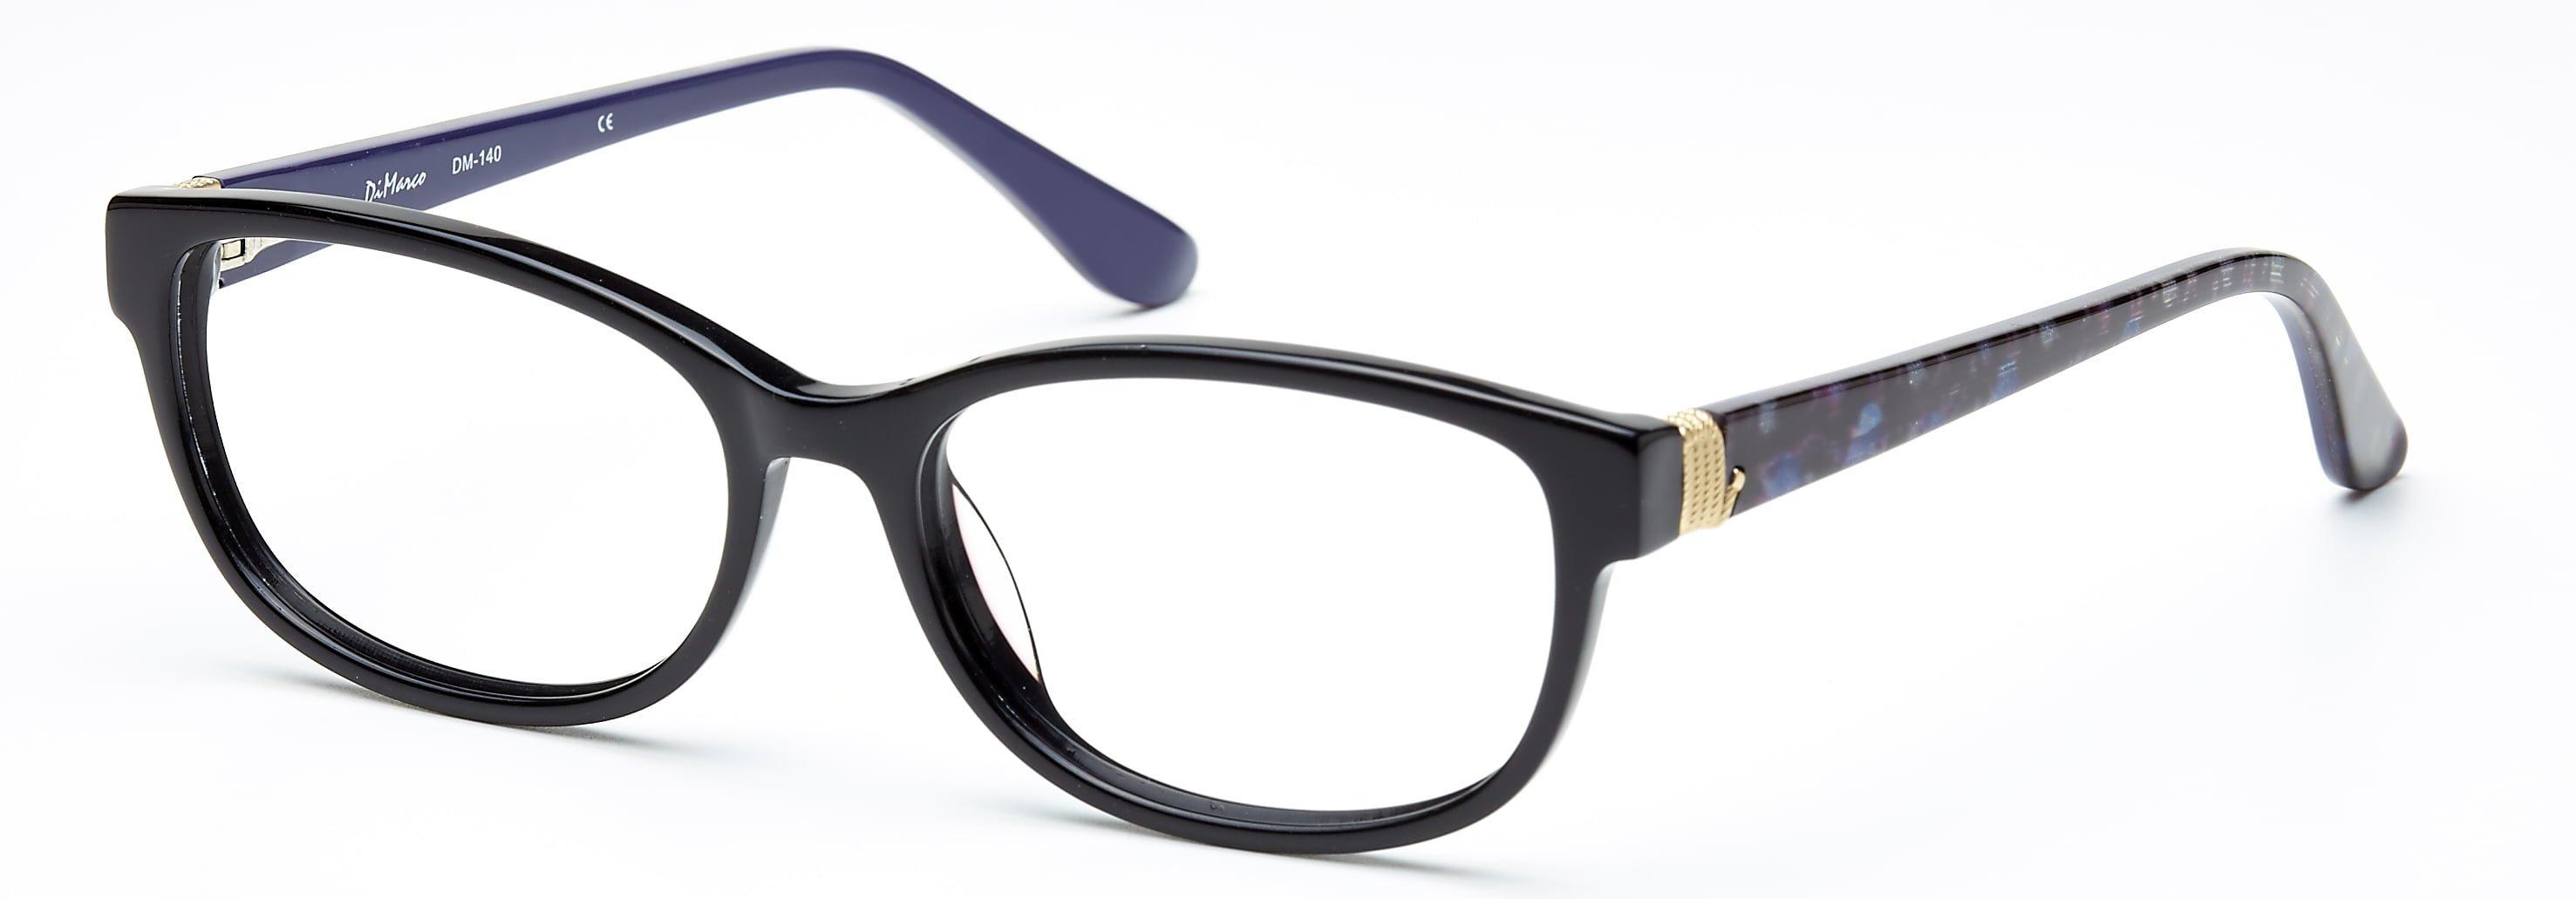 Dimarco Glasses Dm